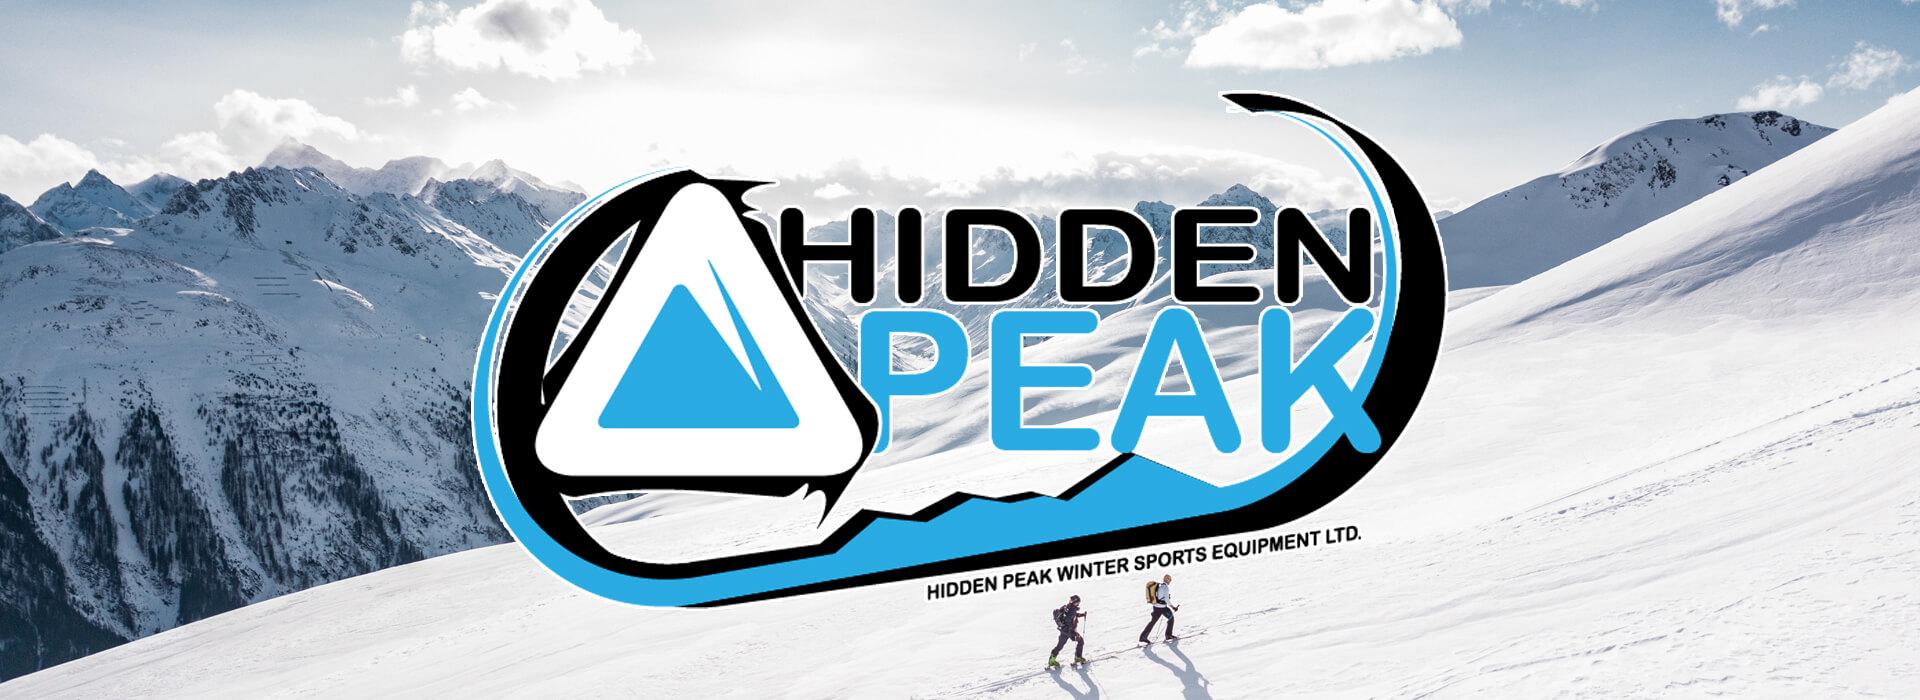 hidden peak customer page header